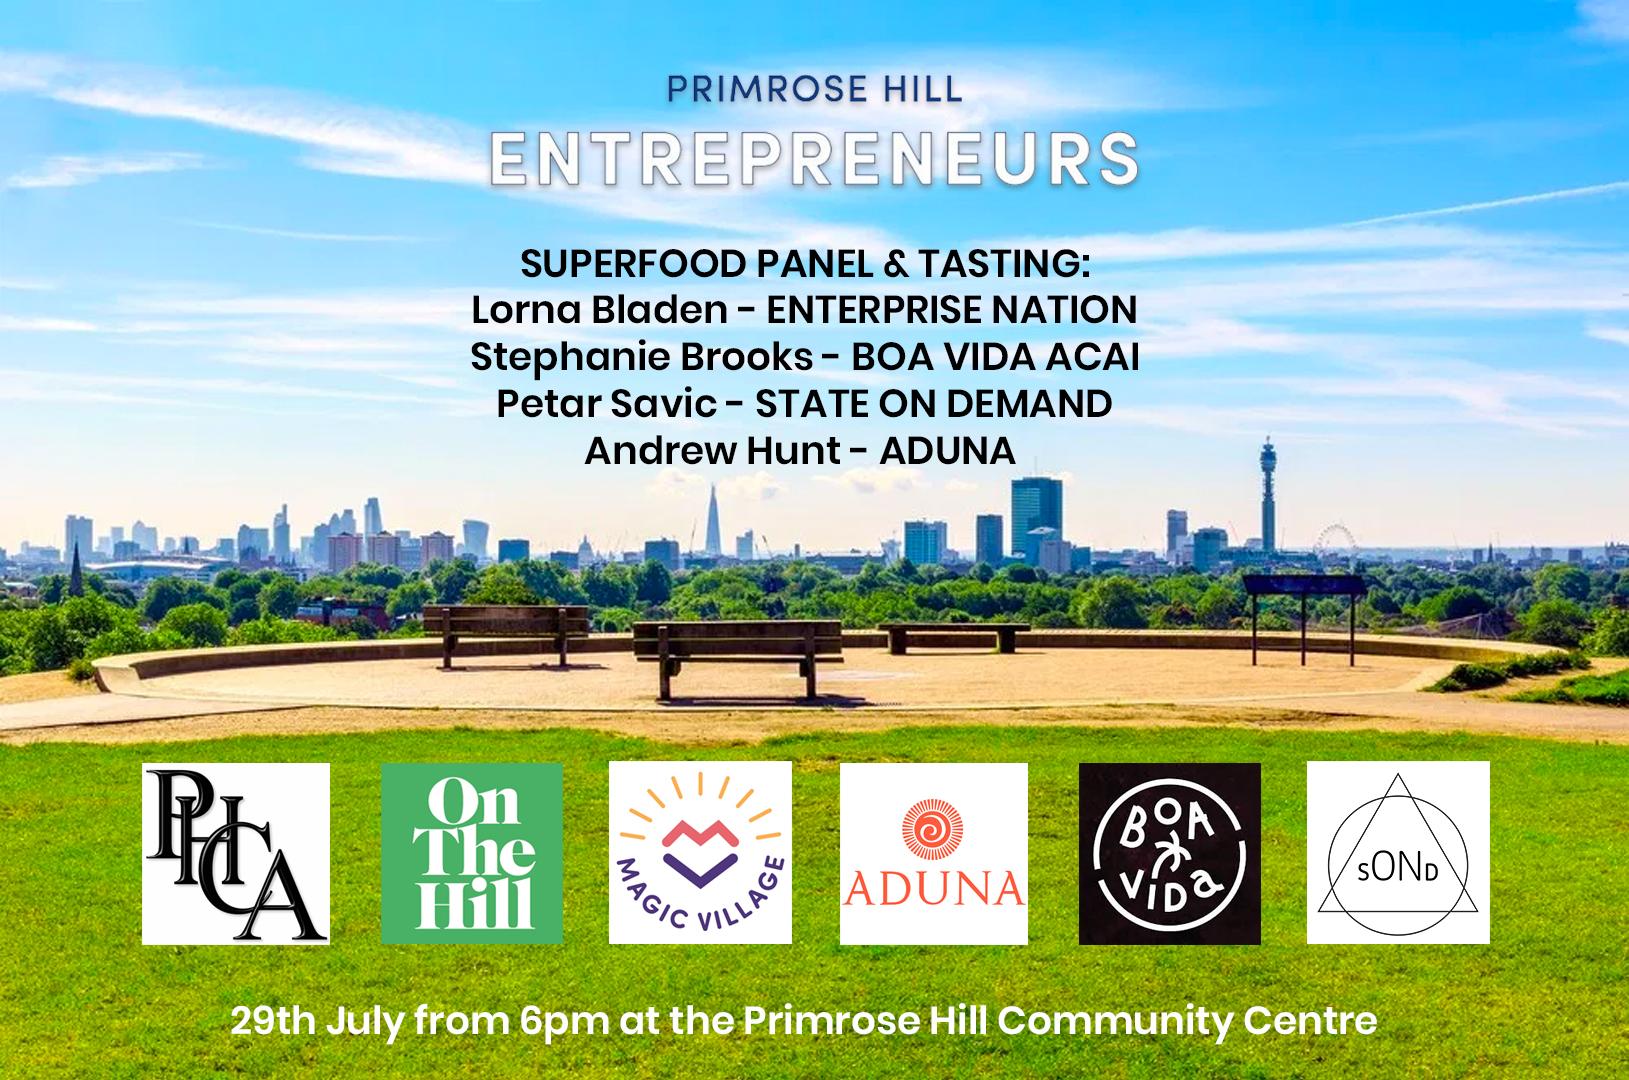 superfoods-panel-primrose-hill